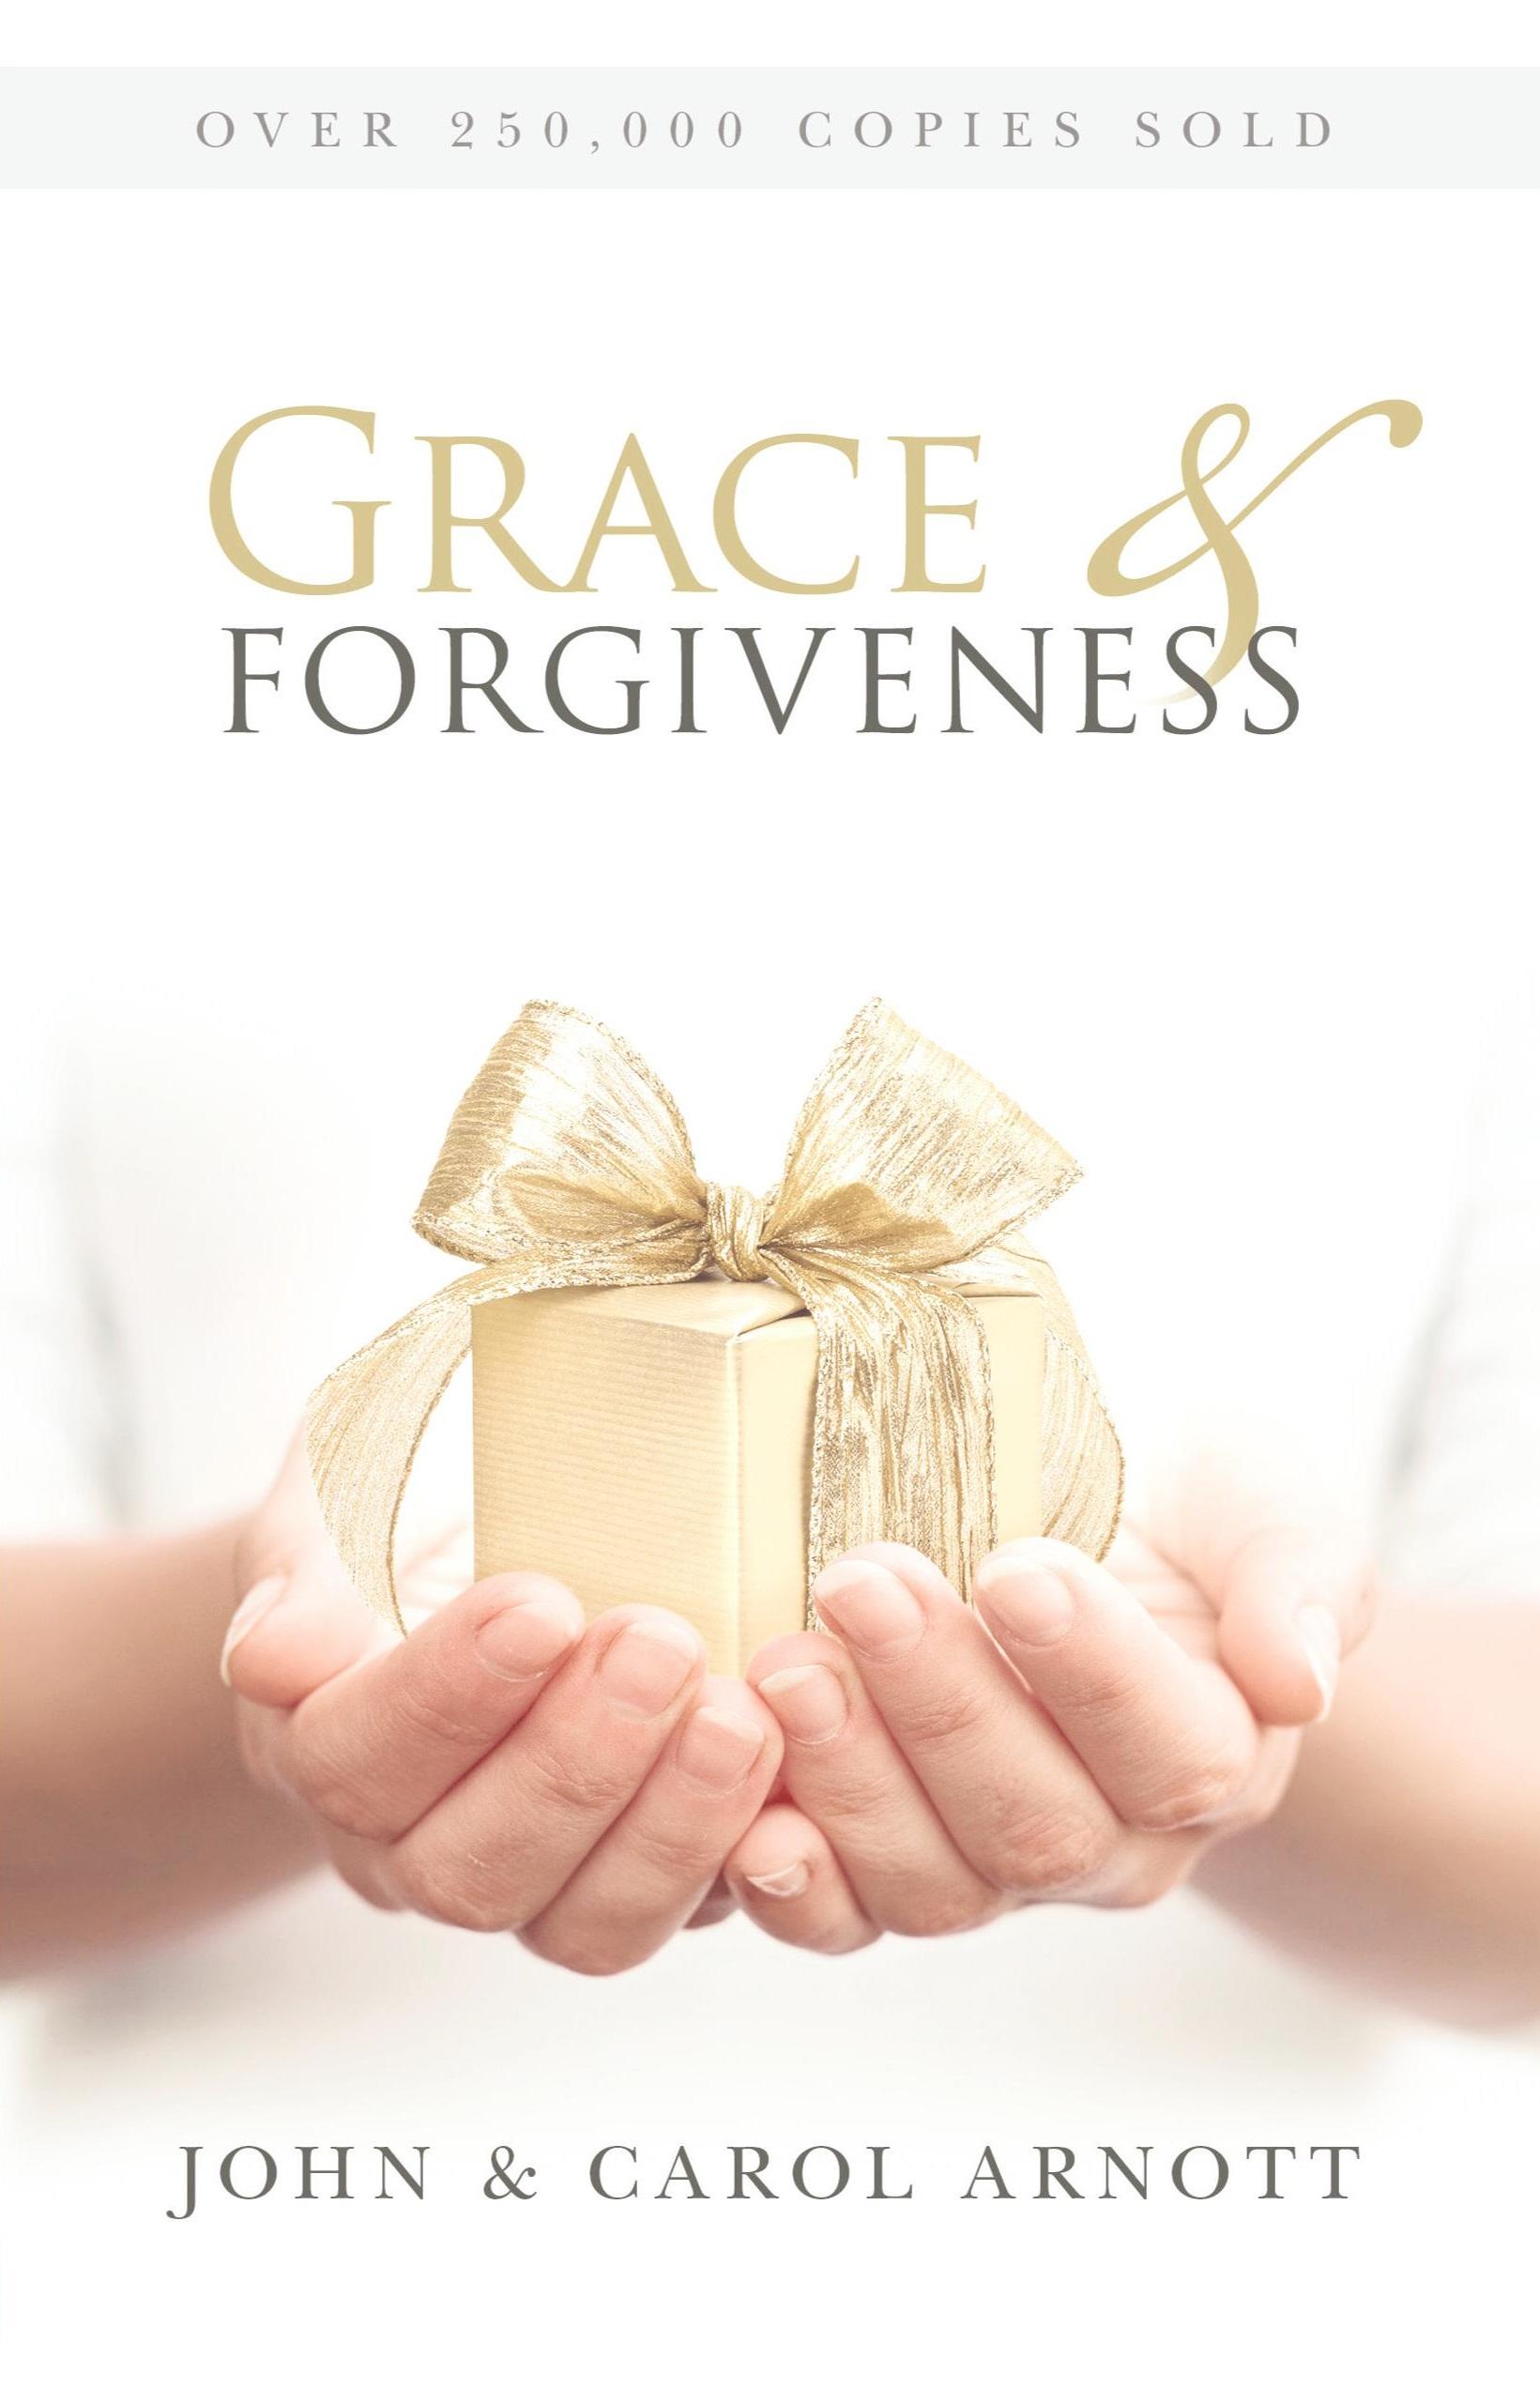 <strong>Grace & Forgiveness</strong><br>John & Carol Arnott